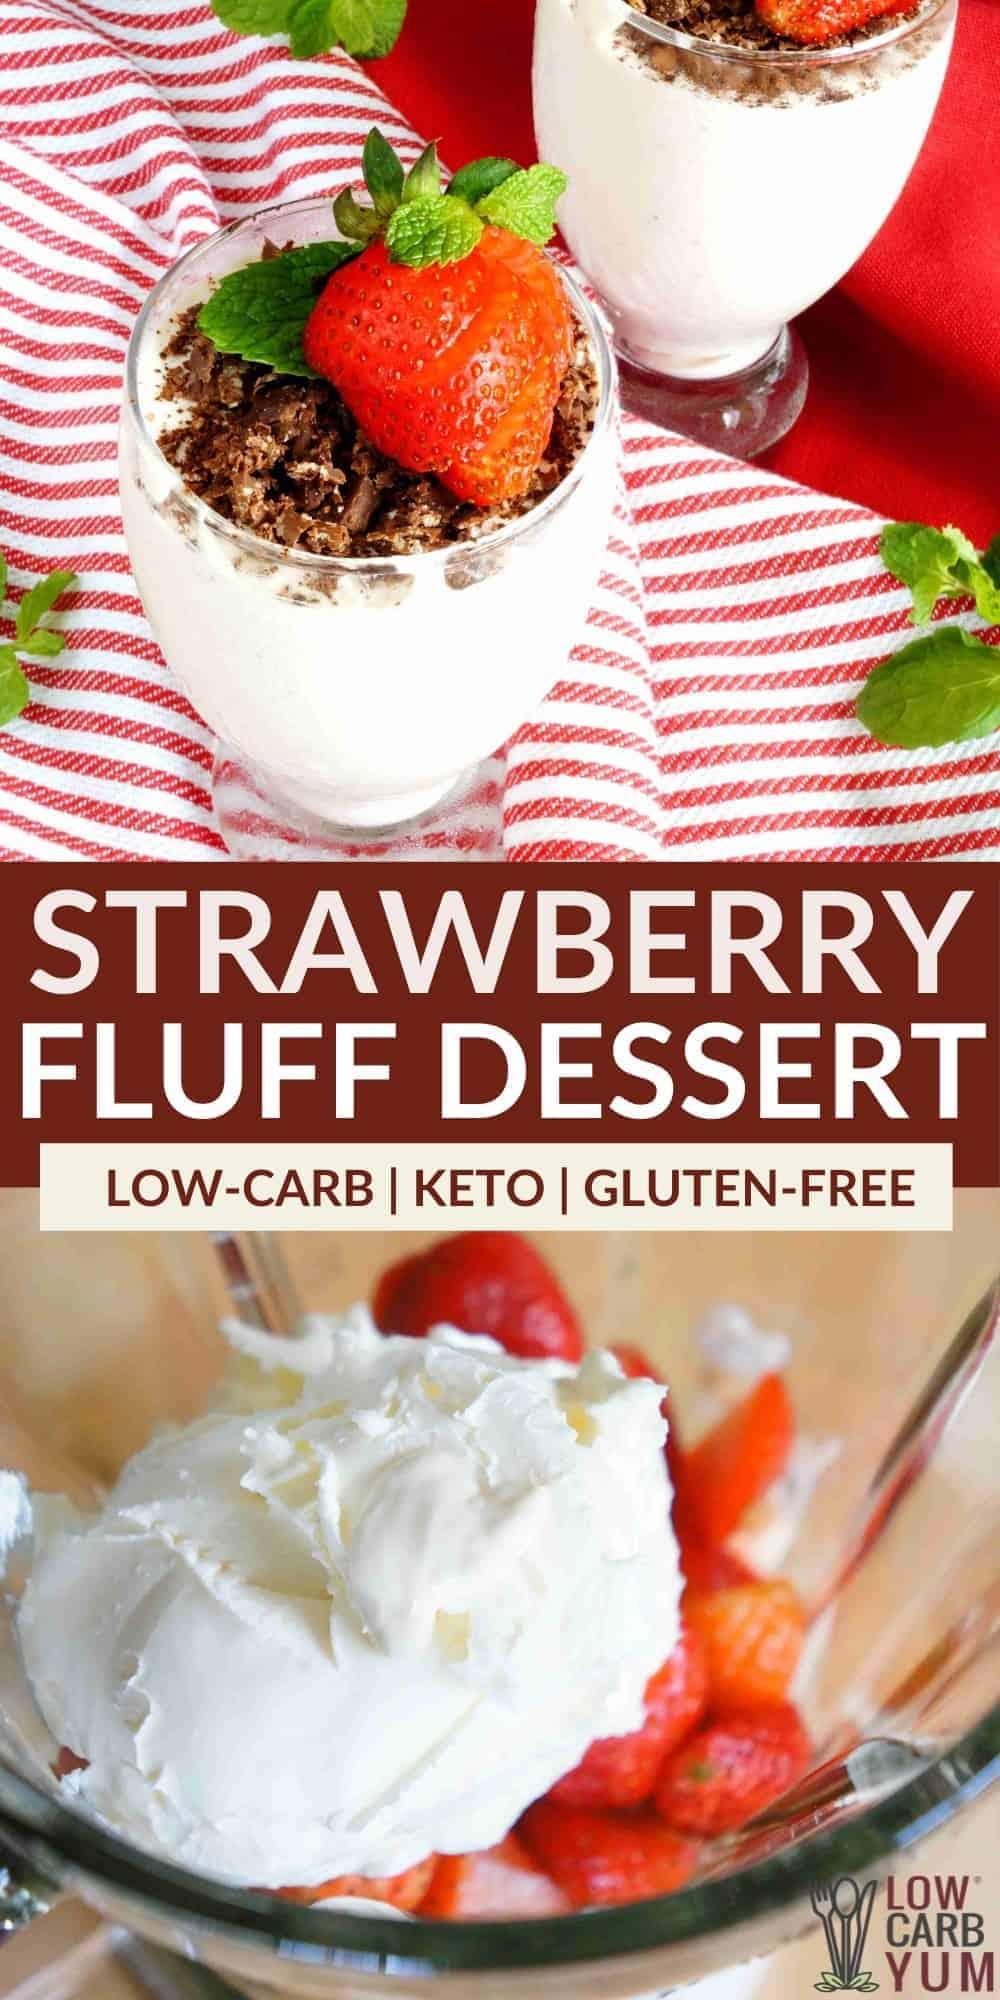 keto strawberry fluff dessert pinterest image